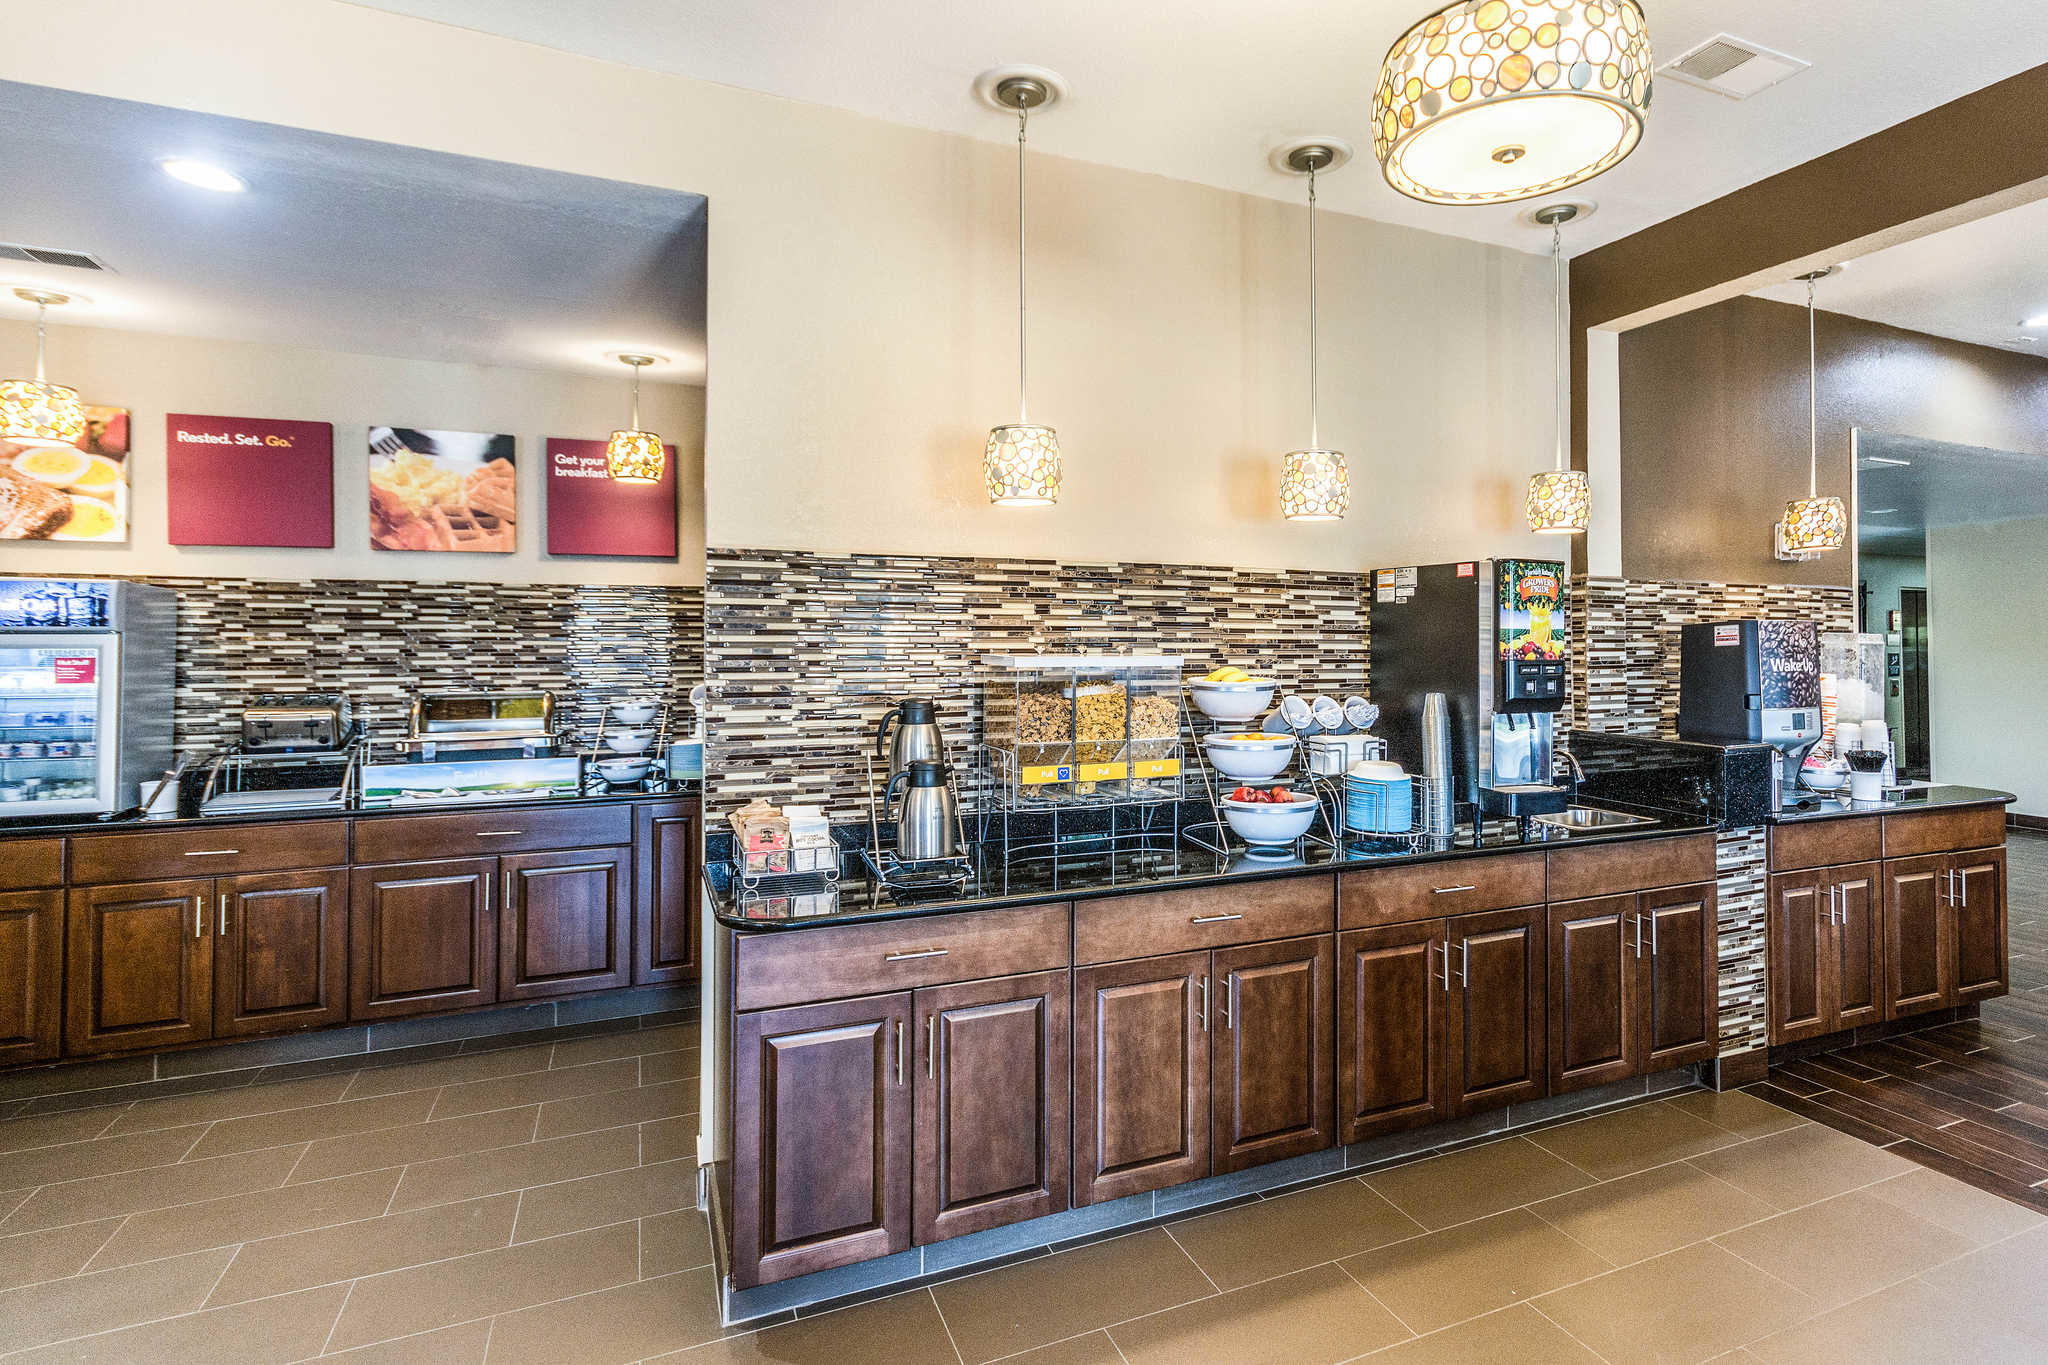 Comfort Inn & Suites North Aurora - Naperville image 31